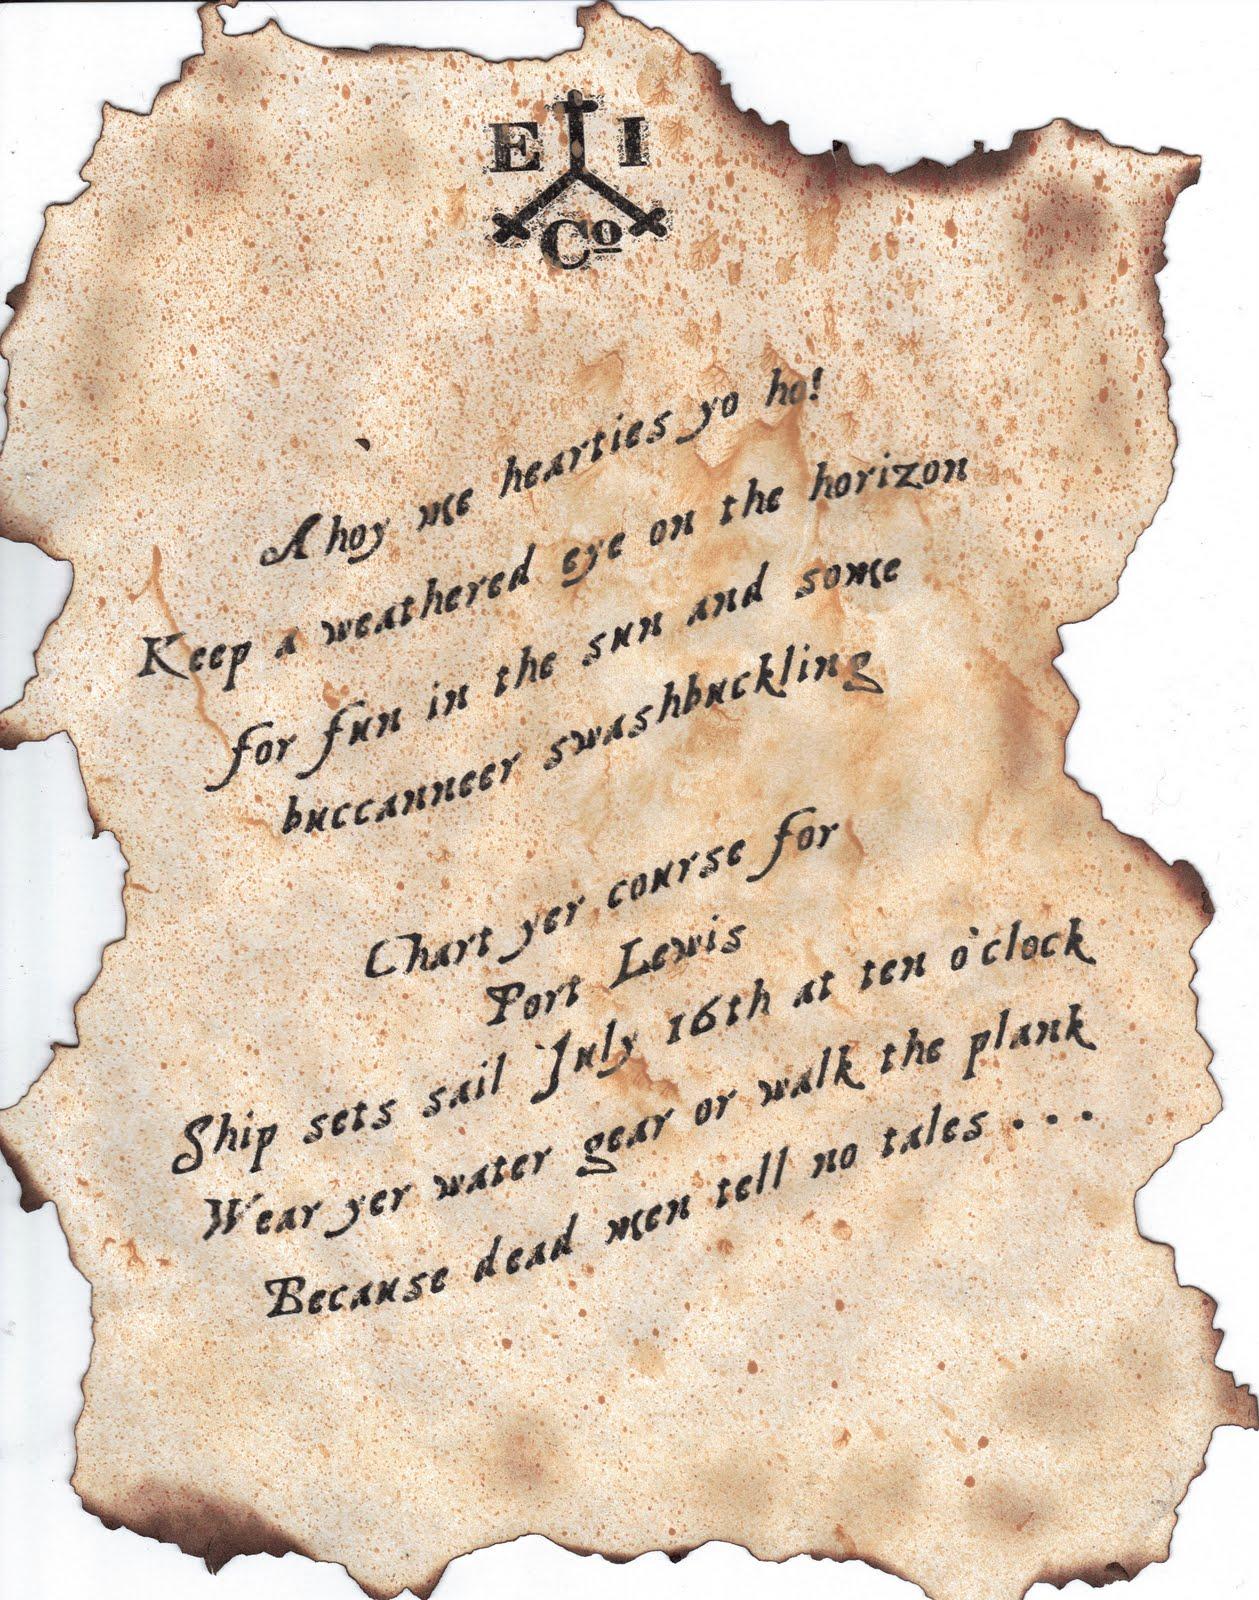 Pirate party invitation wording best printable invitation design phoenix event planning pirate party invitations stopboris Image collections